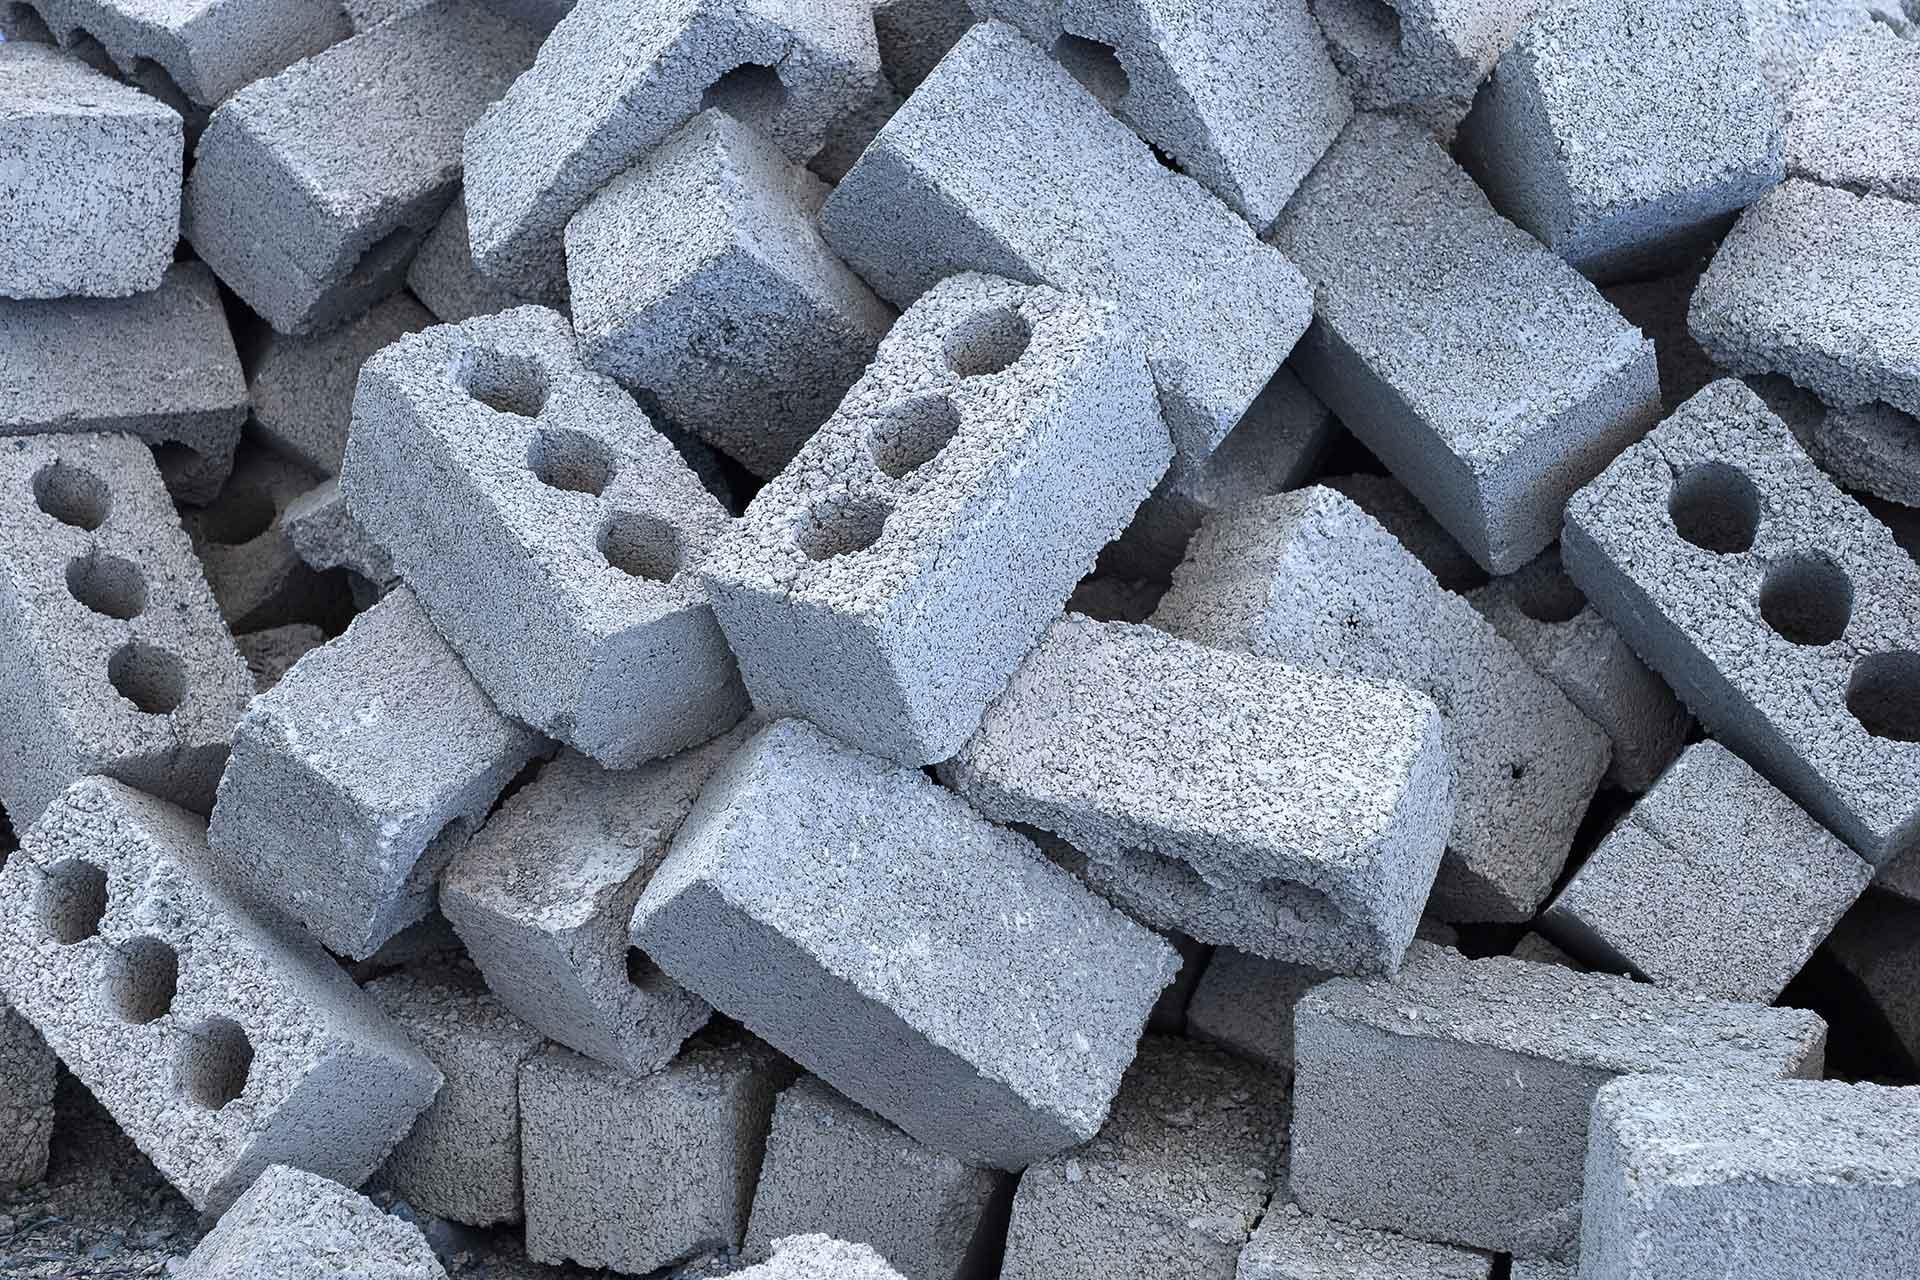 Spraakmakende strafzaken - Spaubeekse betonblokgooier